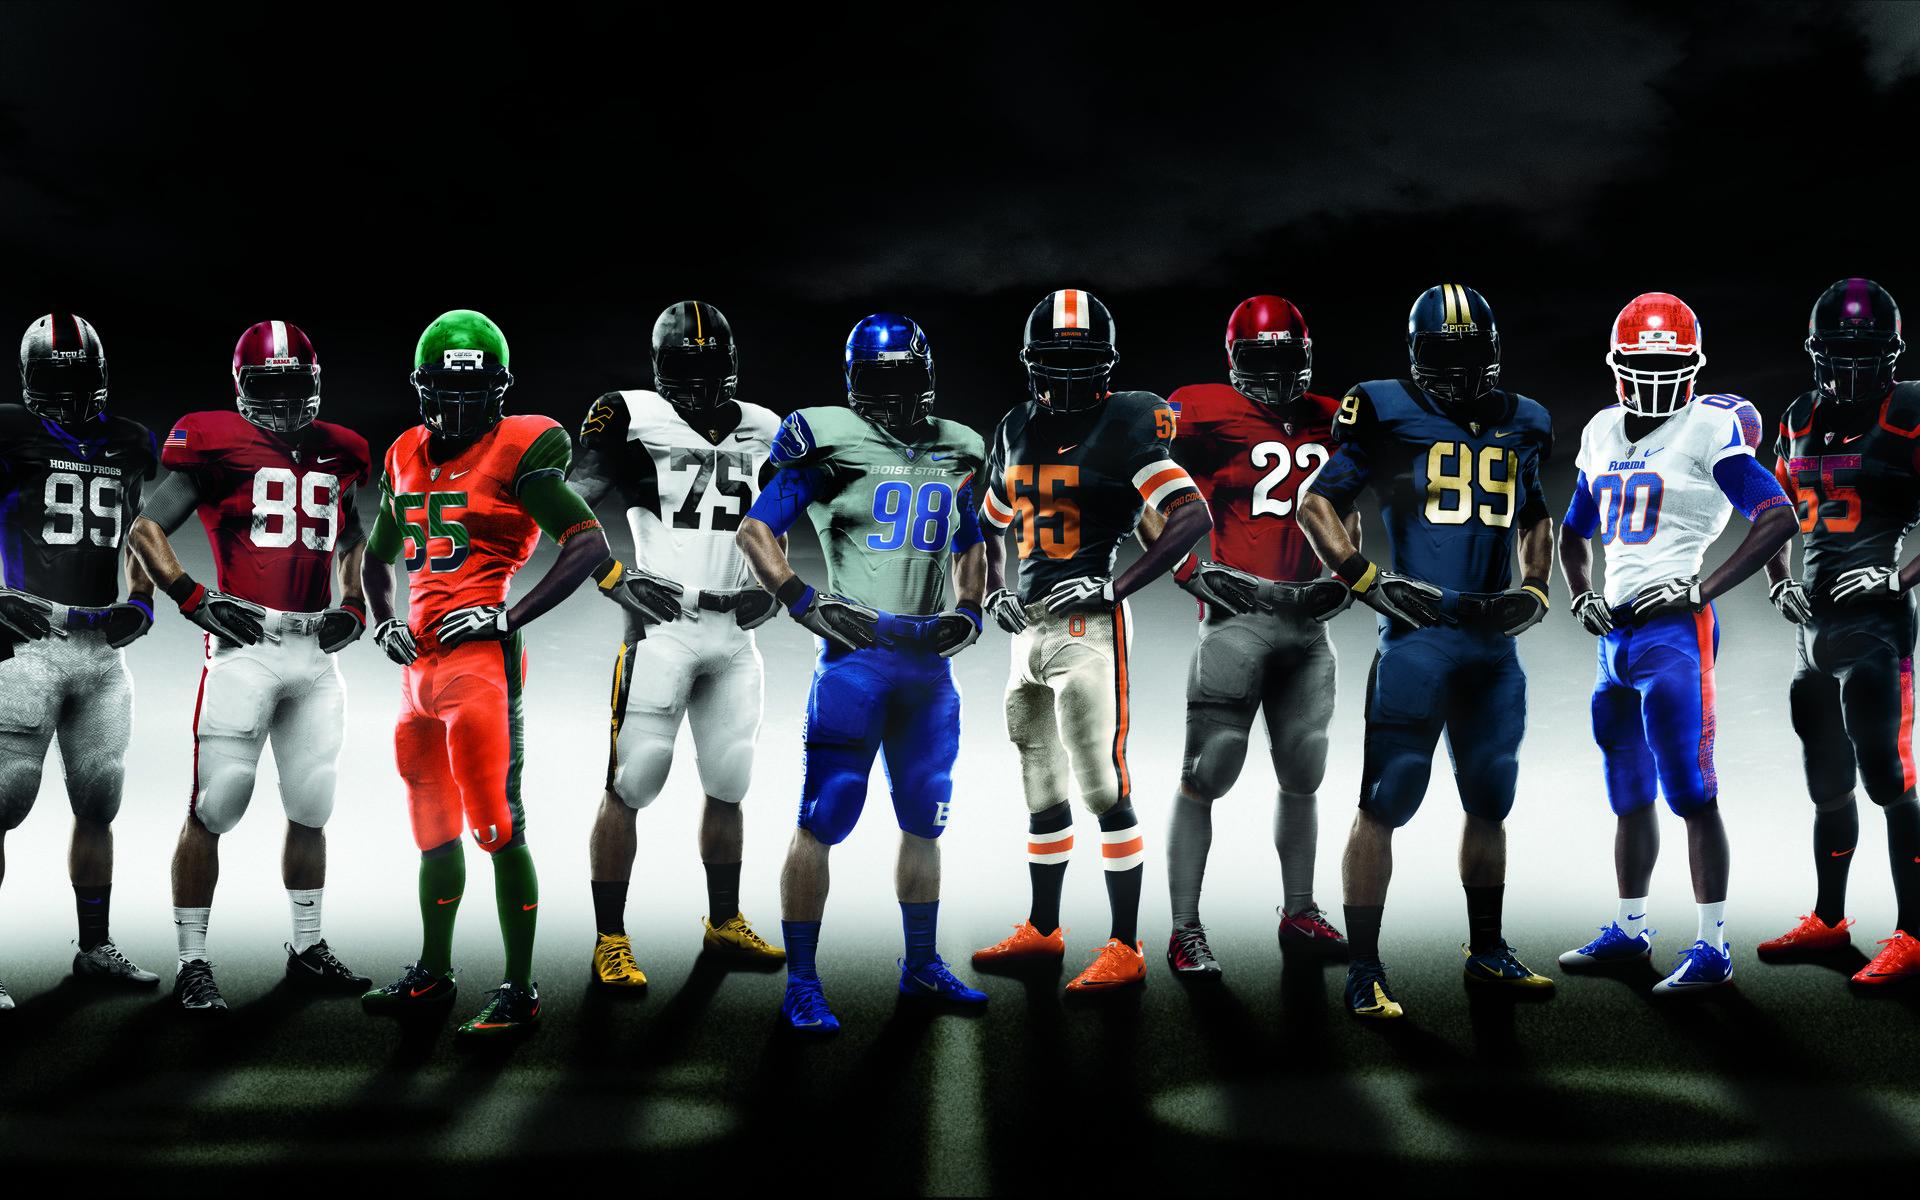 College Football Wallpapers Screensavers